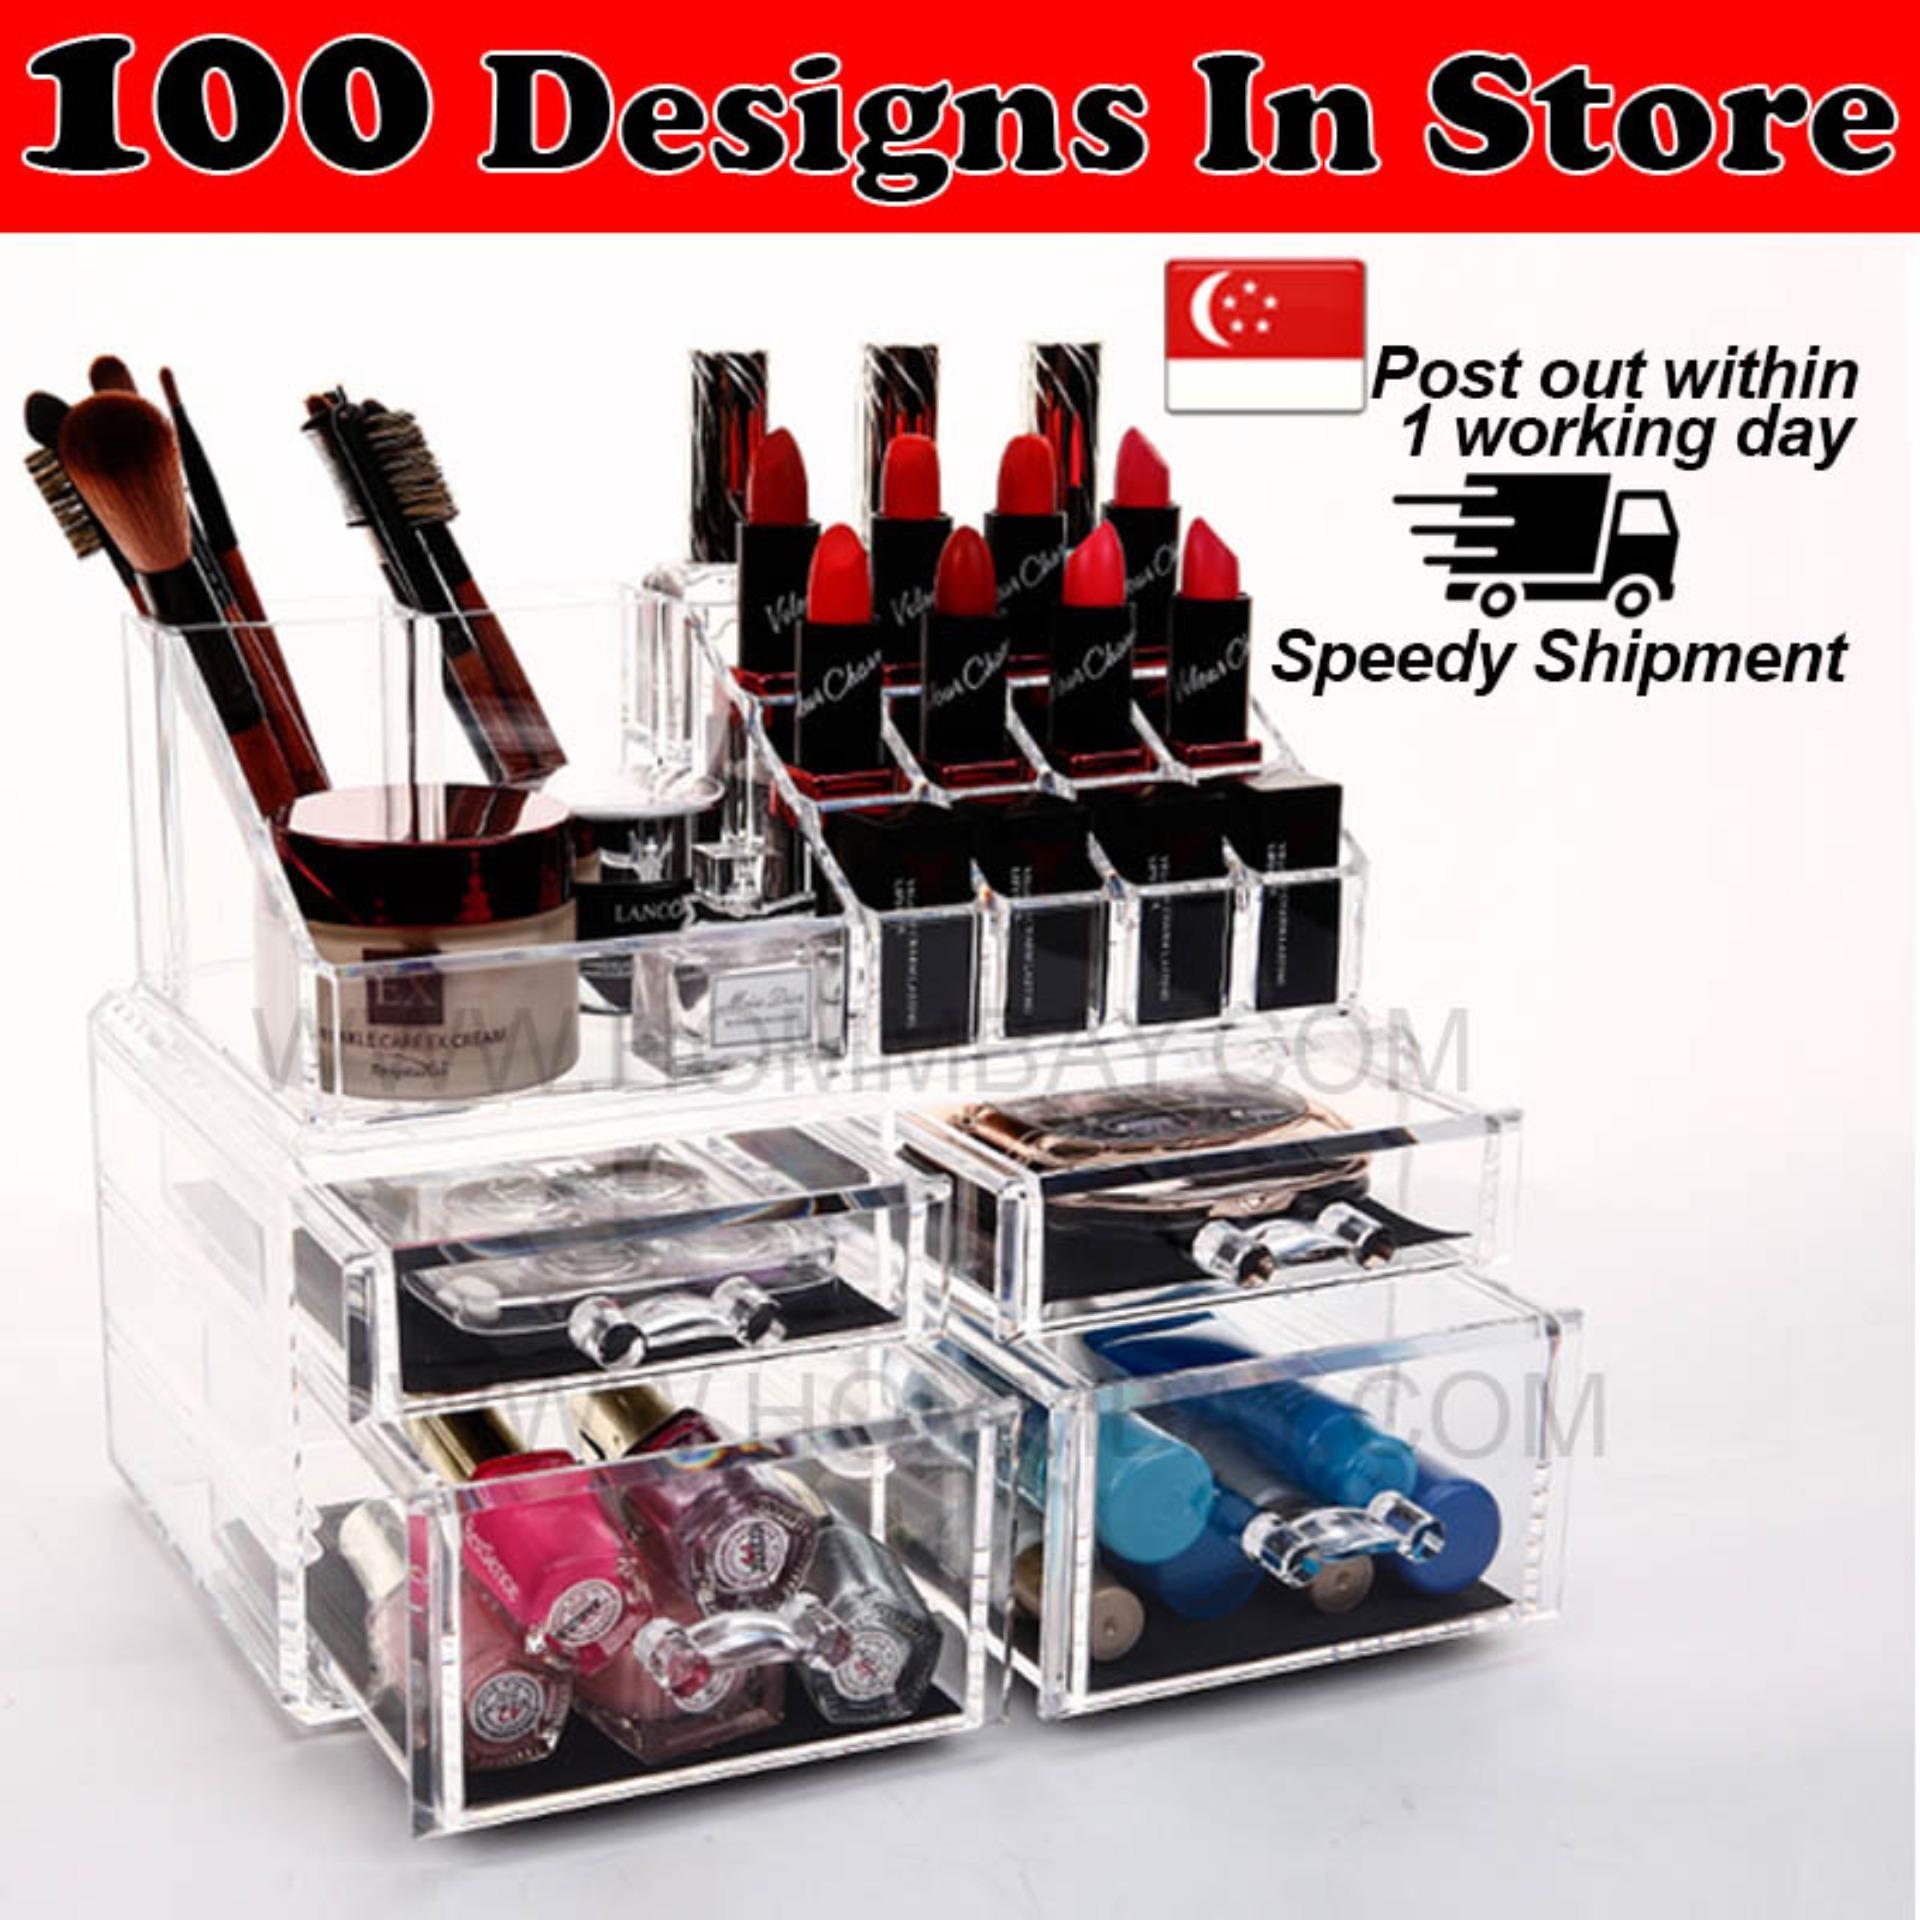 Best Offer Large Acrylic Make Up Makeup Cosmetic Organiser Organizer Storage Box Holder